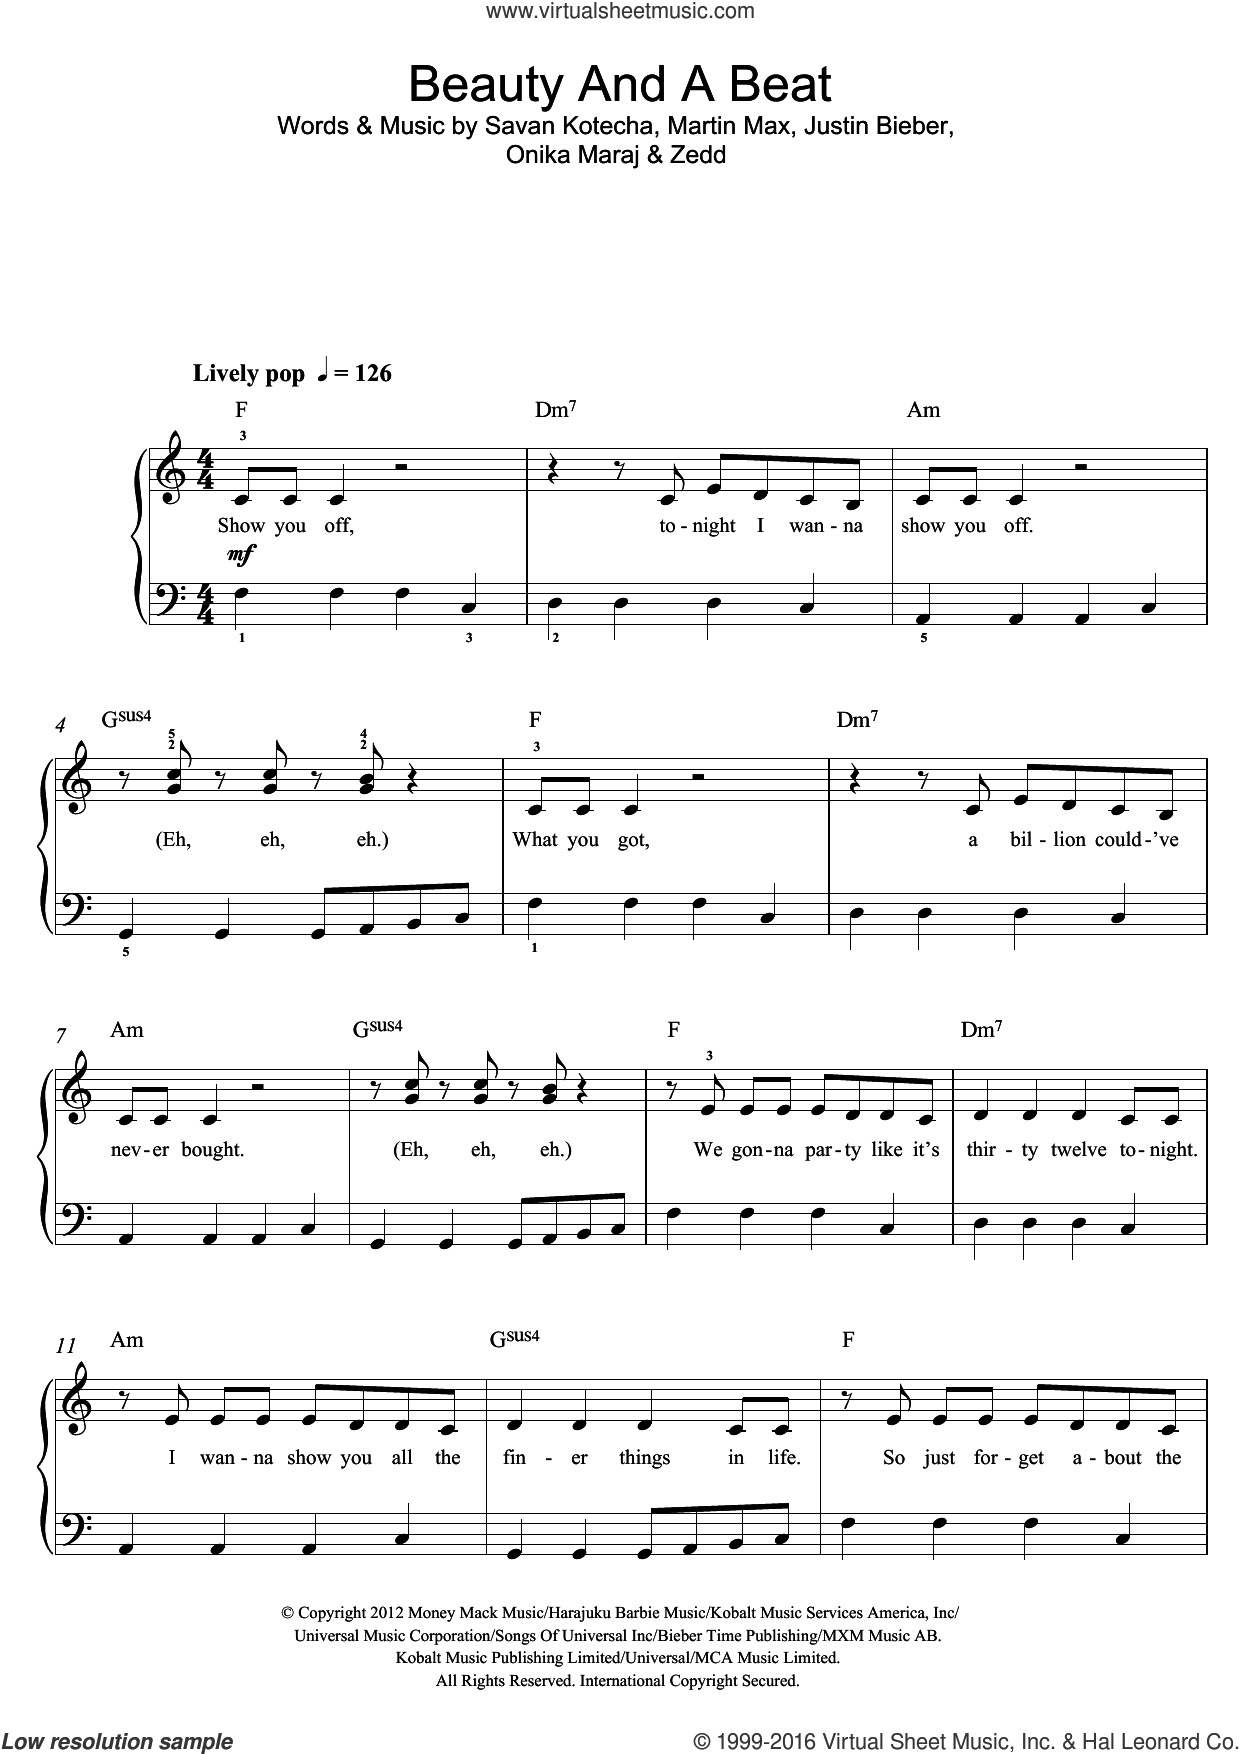 Beauty And A Beat (featuring Nicki Minaj) sheet music for voice, piano or guitar by Justin Bieber, Nicki Minaj, Martin Max, Onika Maraj, Savan Kotecha and Zedd, intermediate skill level